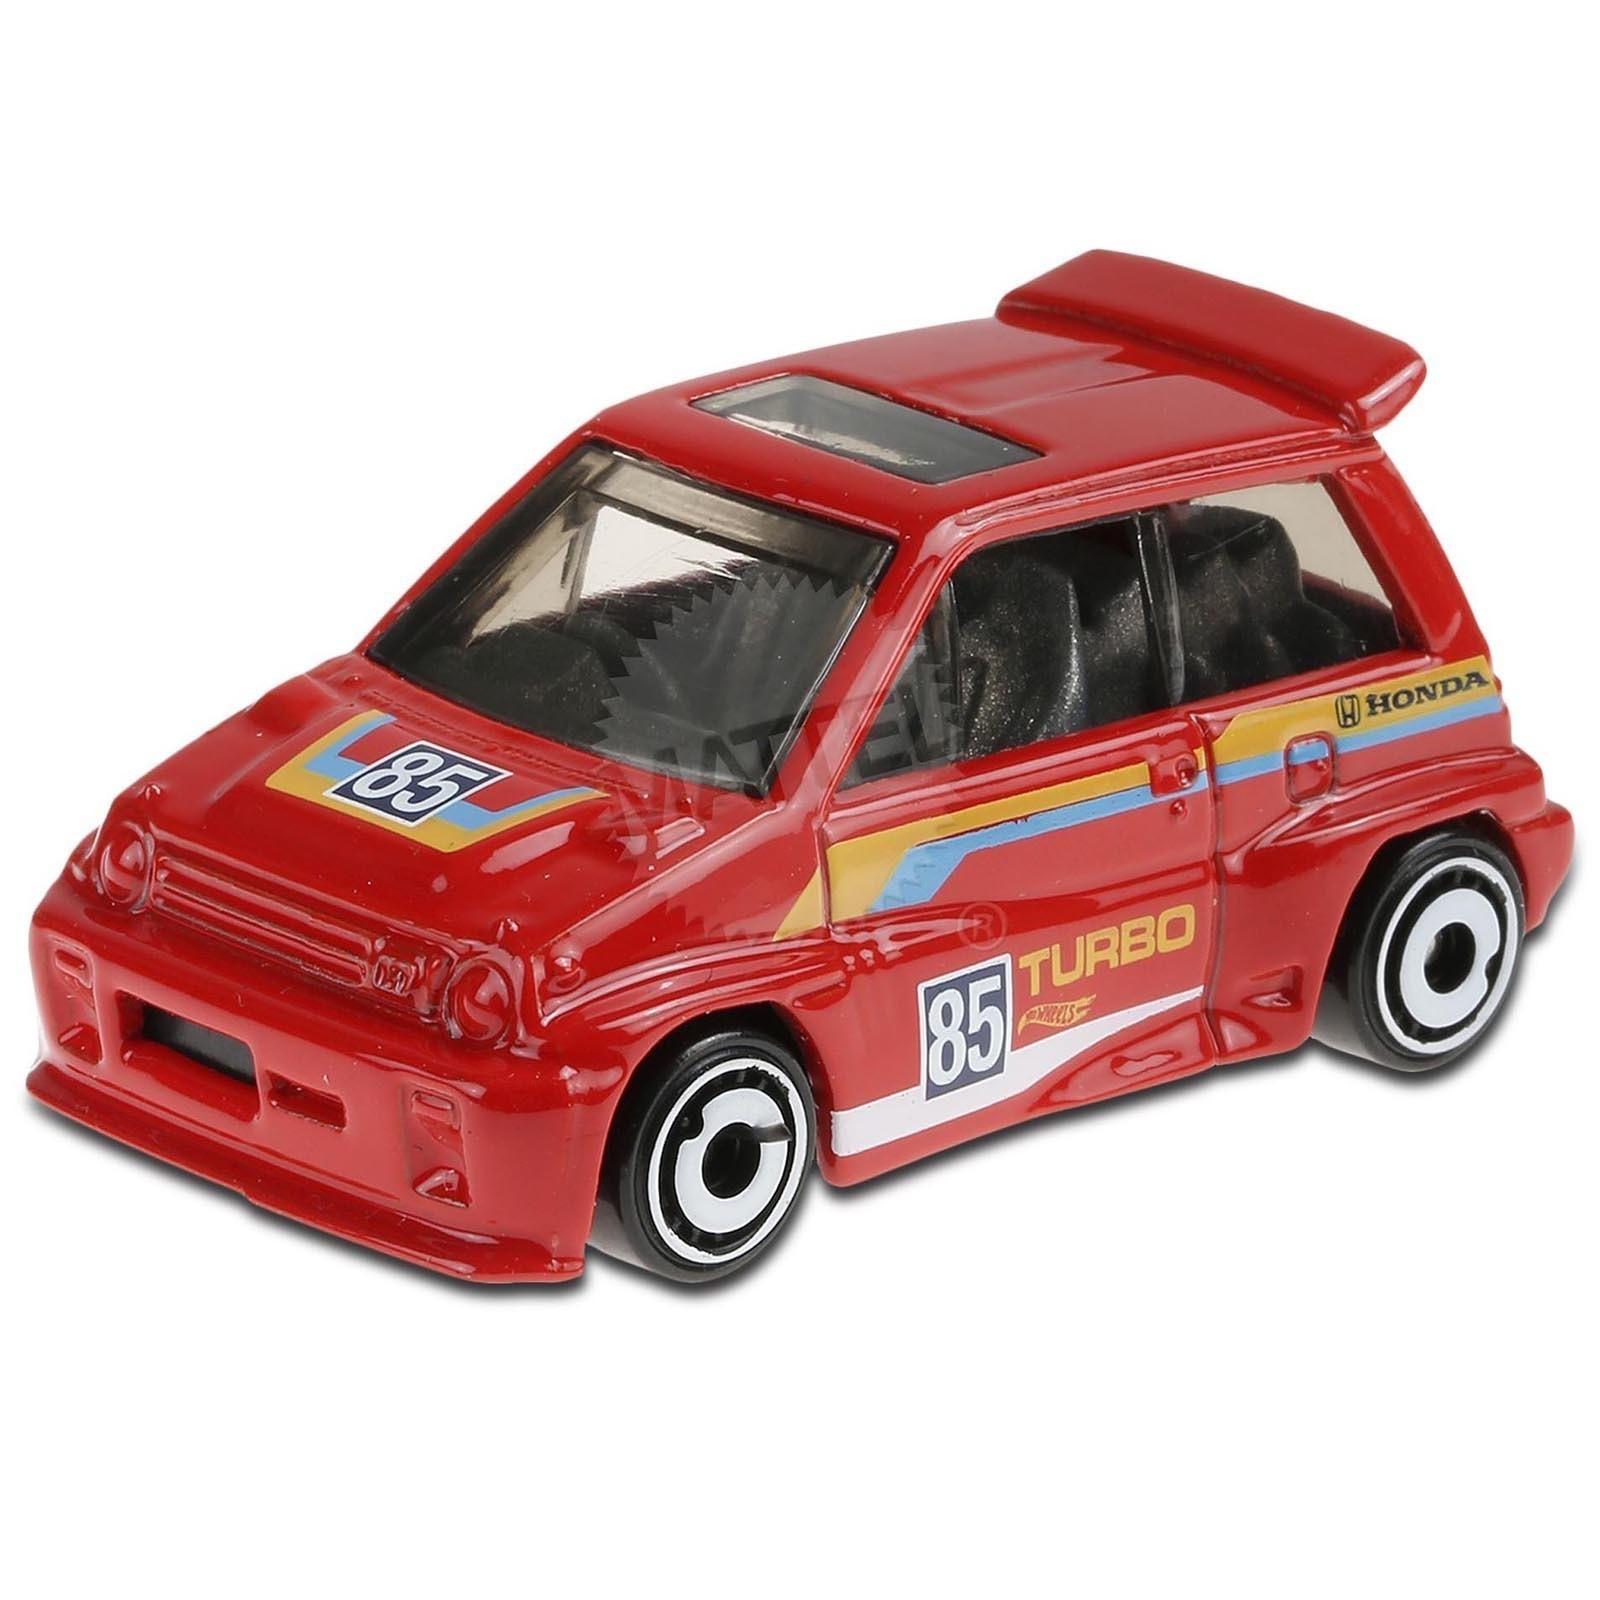 Carrinho Hot Wheels '85 Honda City Turbo II (OYHIW) HW Race Day